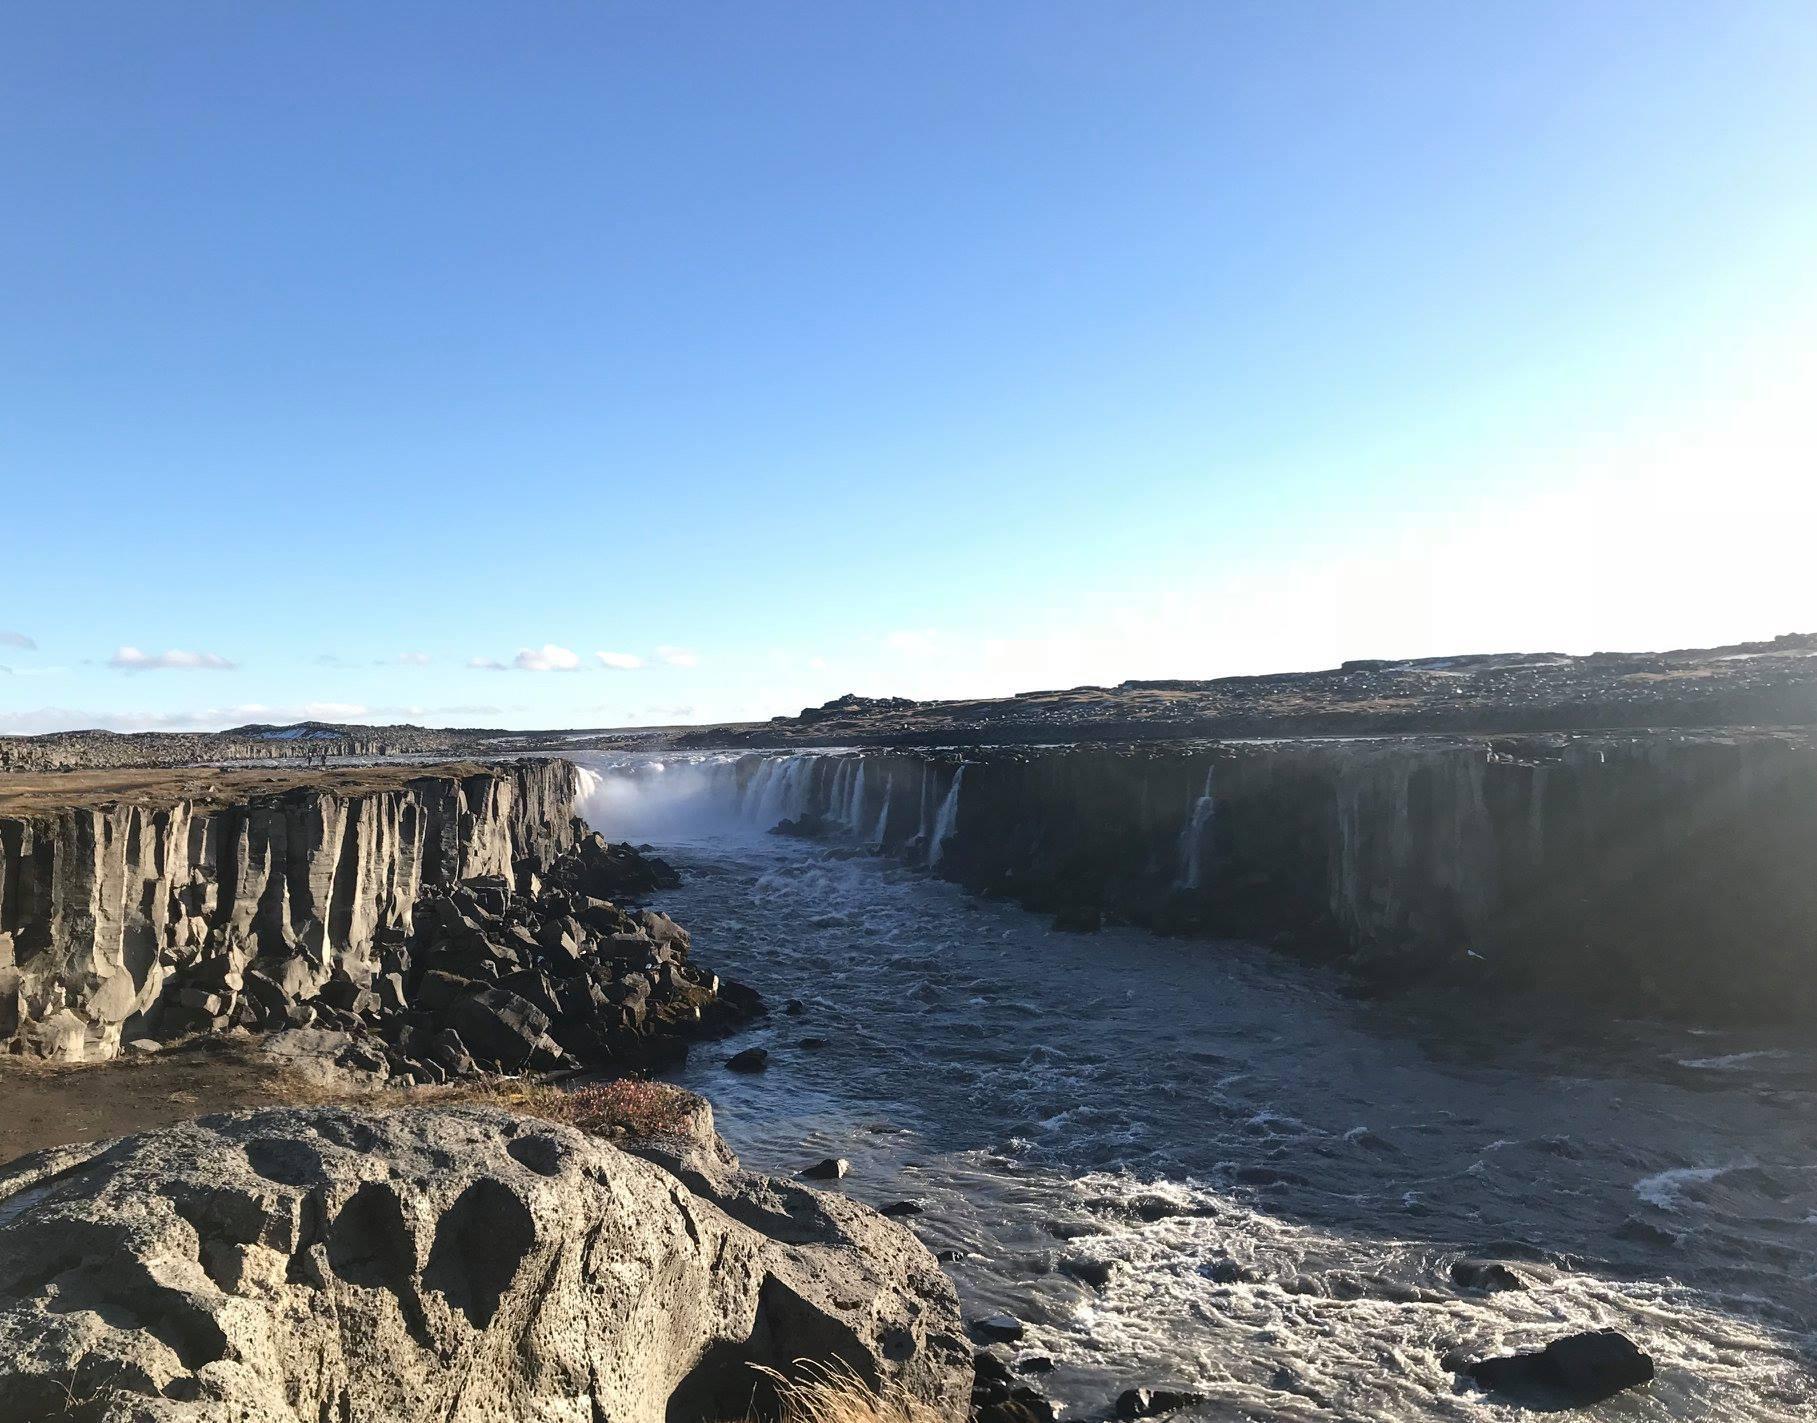 The view at Selfoss